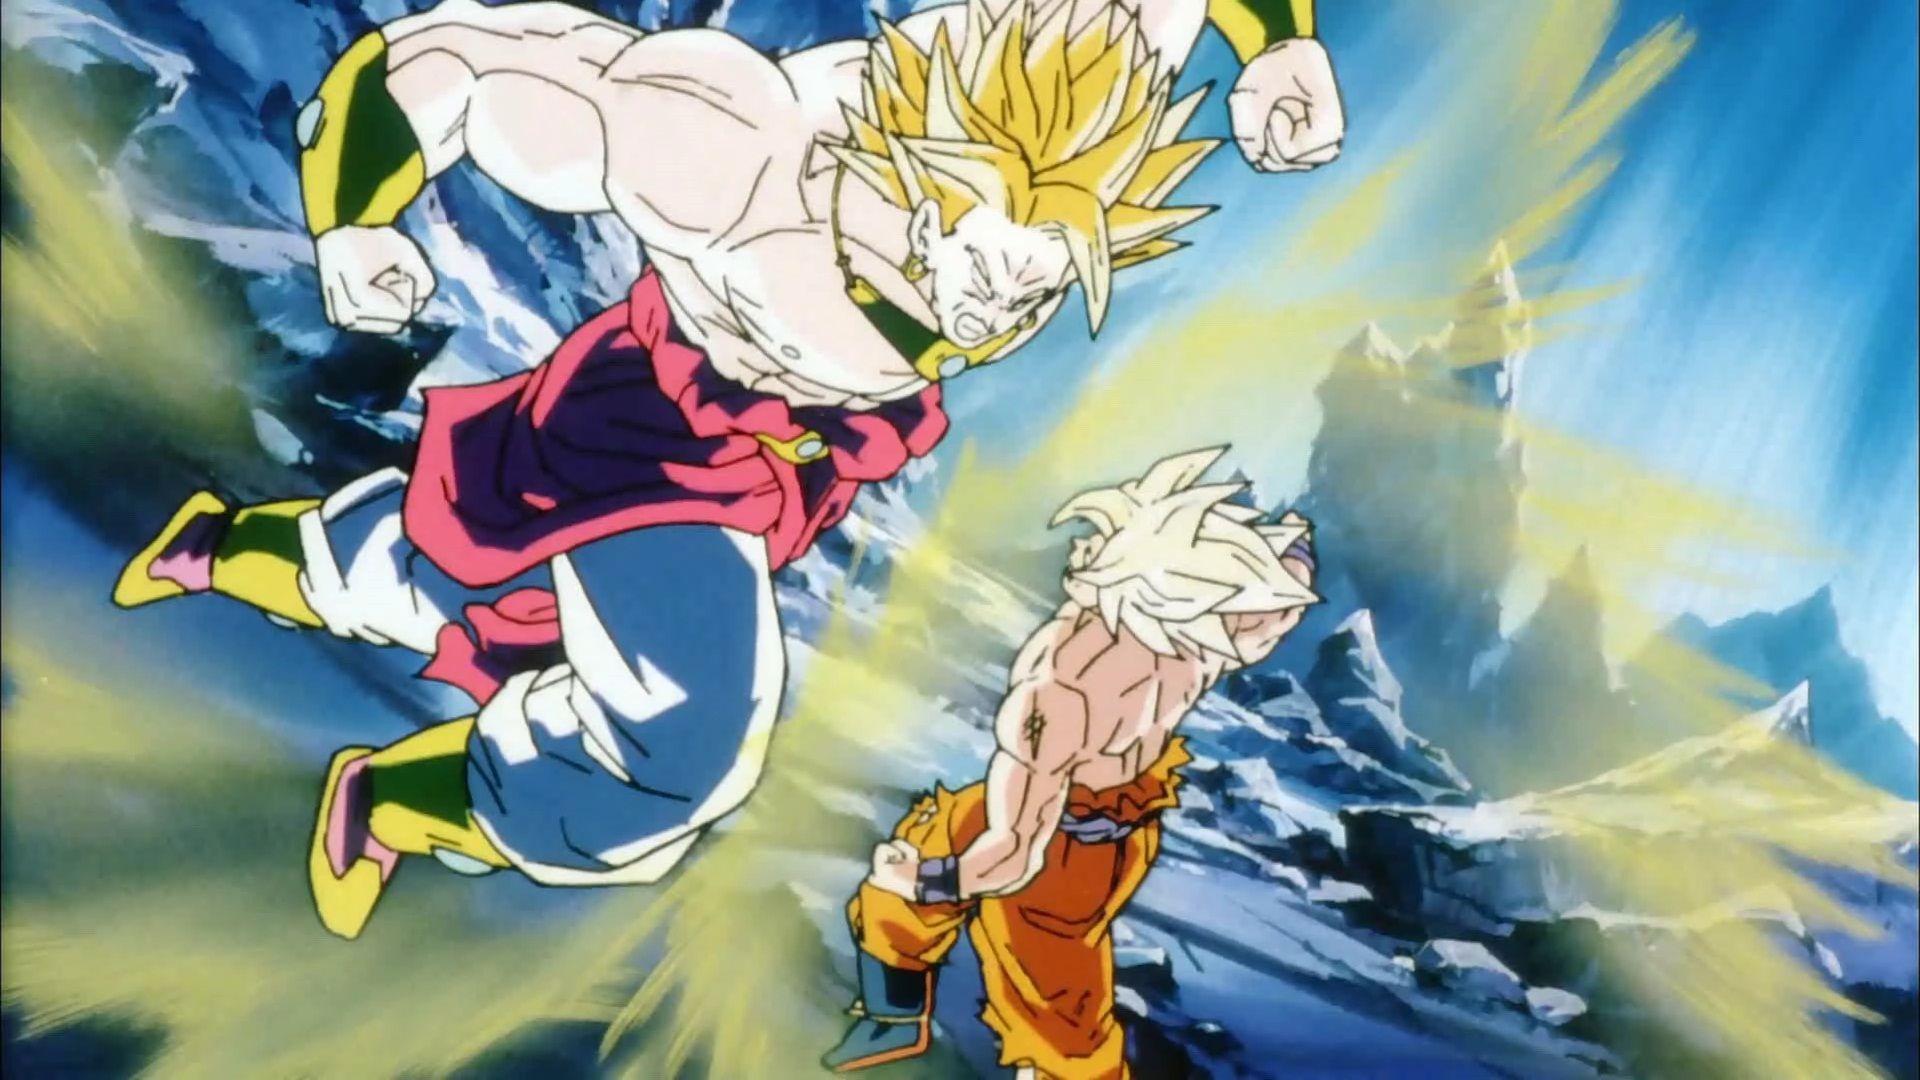 Dragon Ball Z Goku Vs Broly Wallpapers Wallpaper Cave